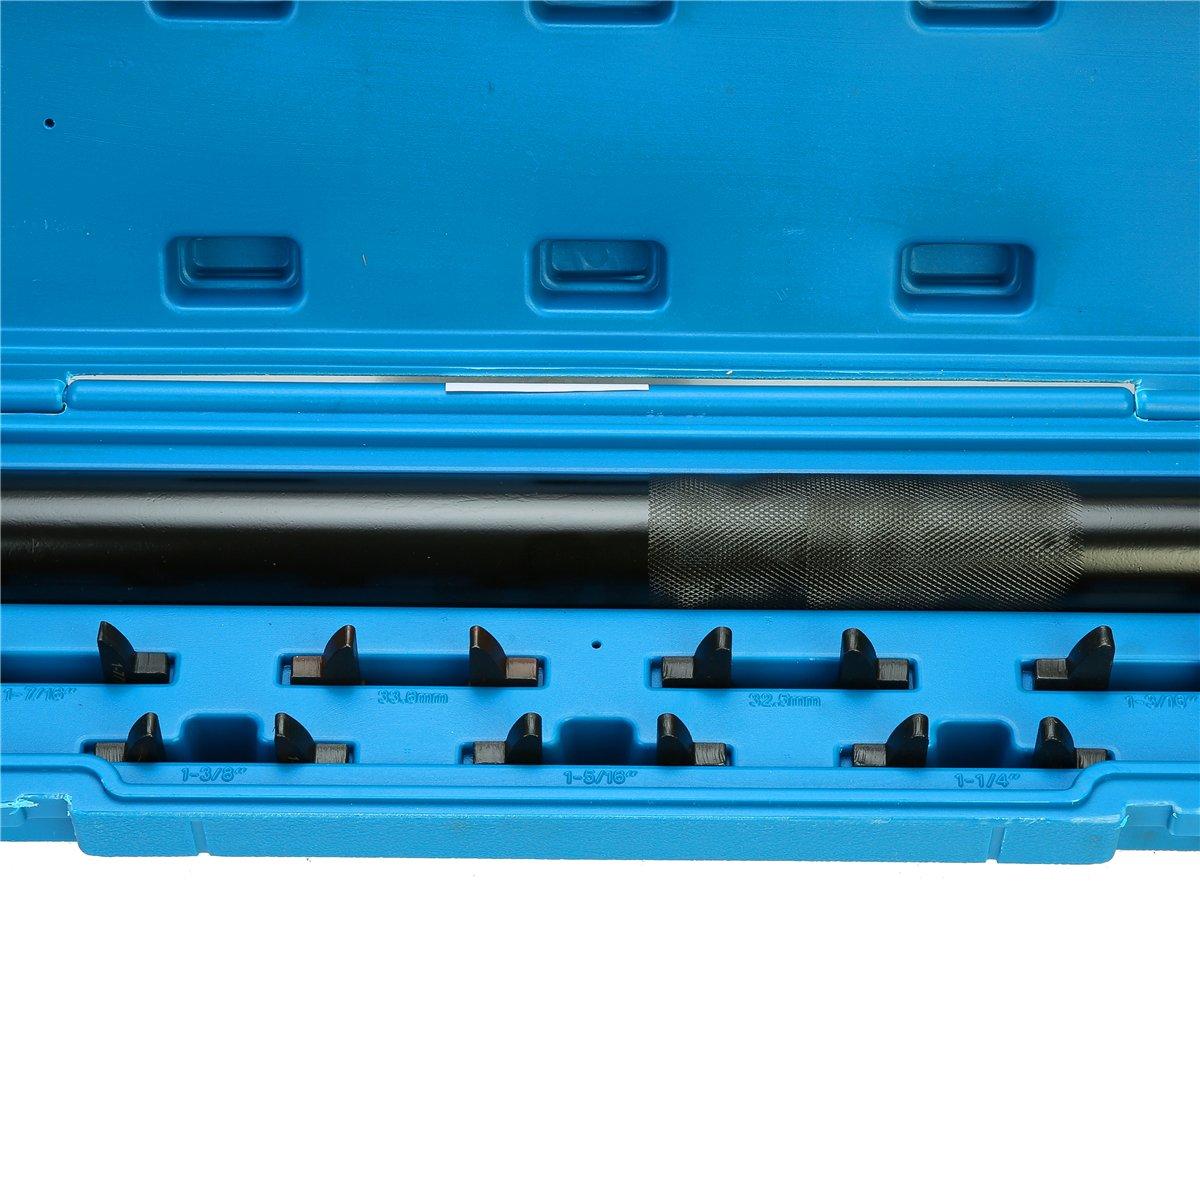 8MILELAKE Auto Car Truck Inner Tie Rod Tool Installer Remover Crews Foot Wrench Kit W//Case